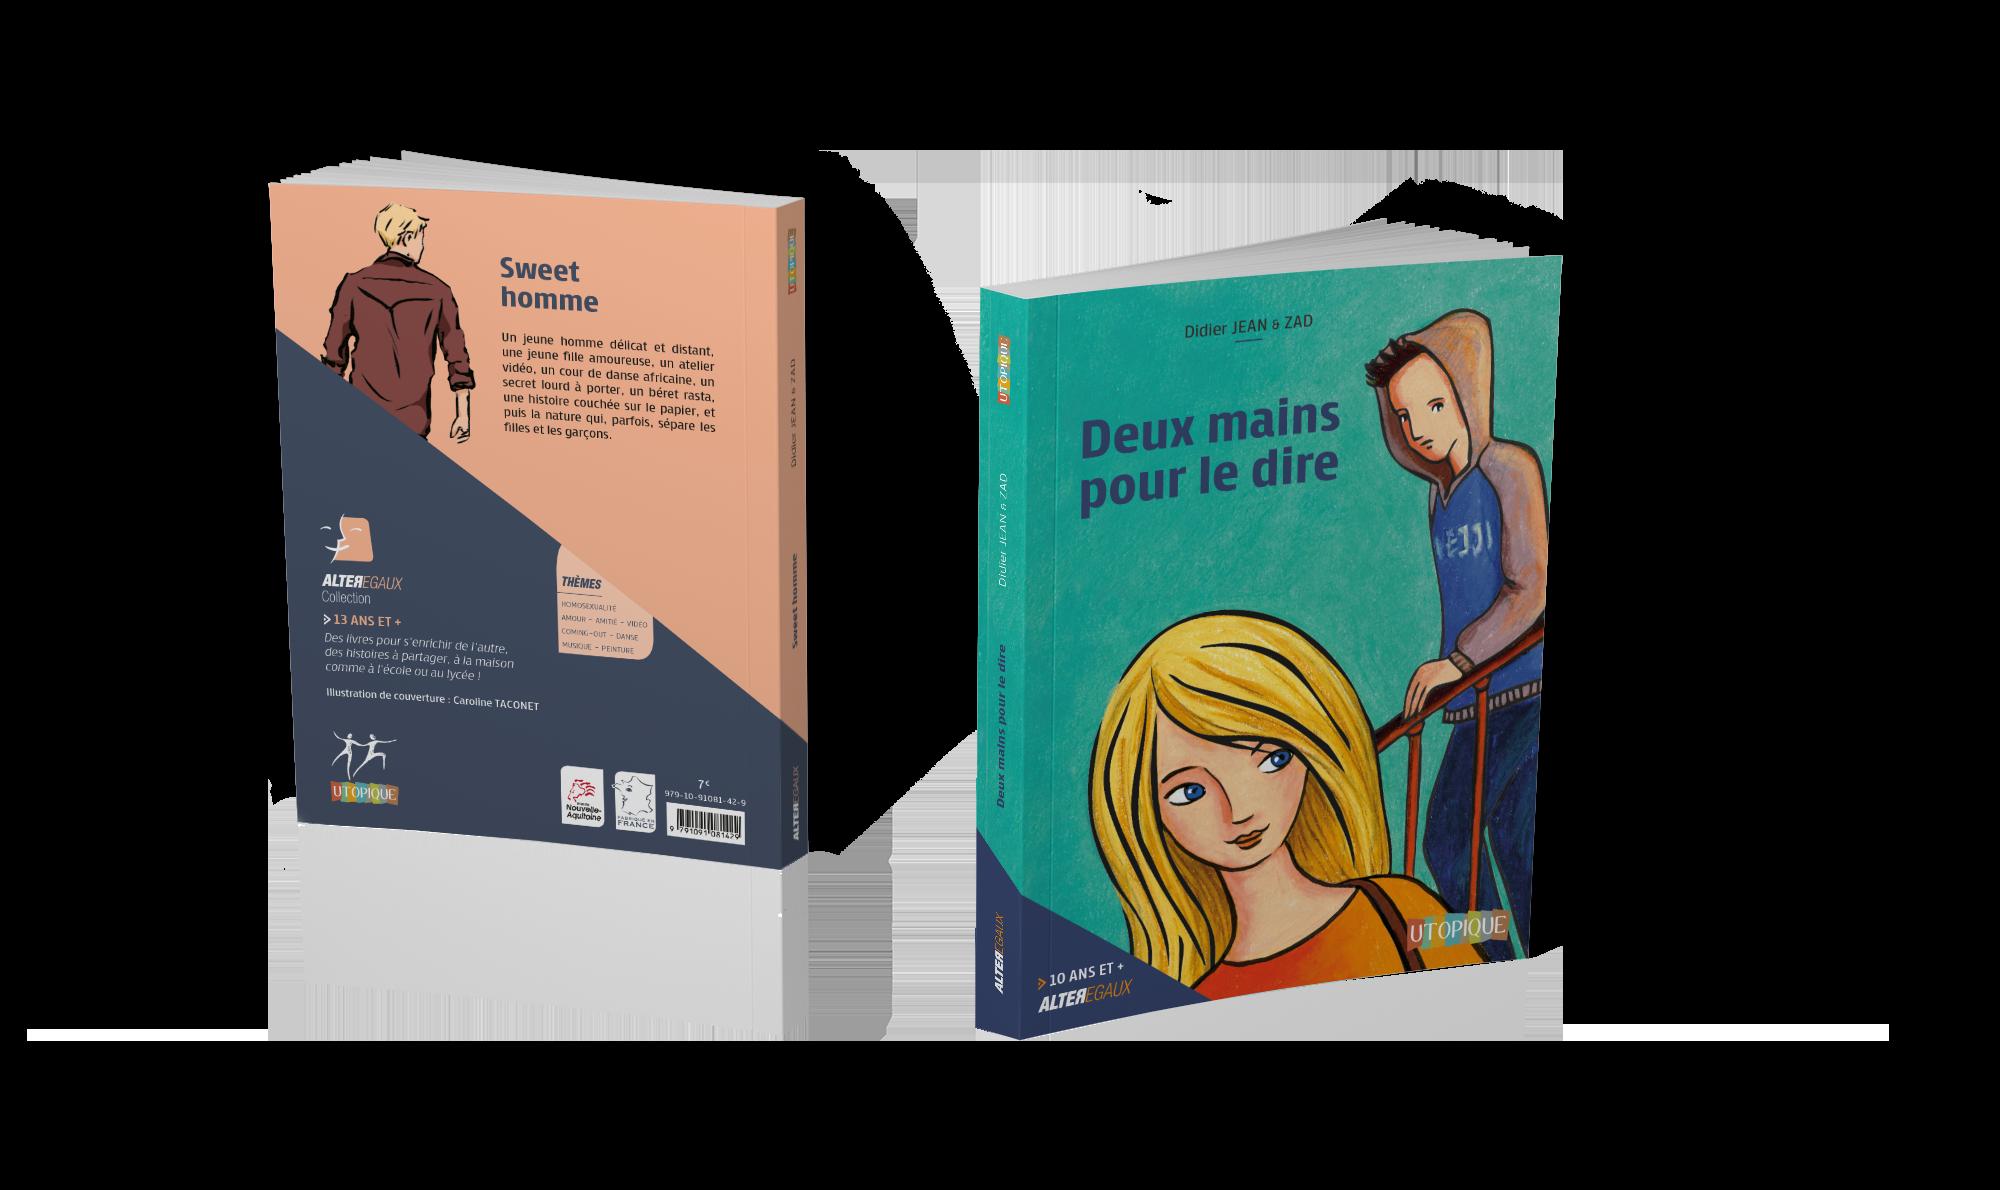 editions-utopique-mise-en-page-print-supports-imprimes